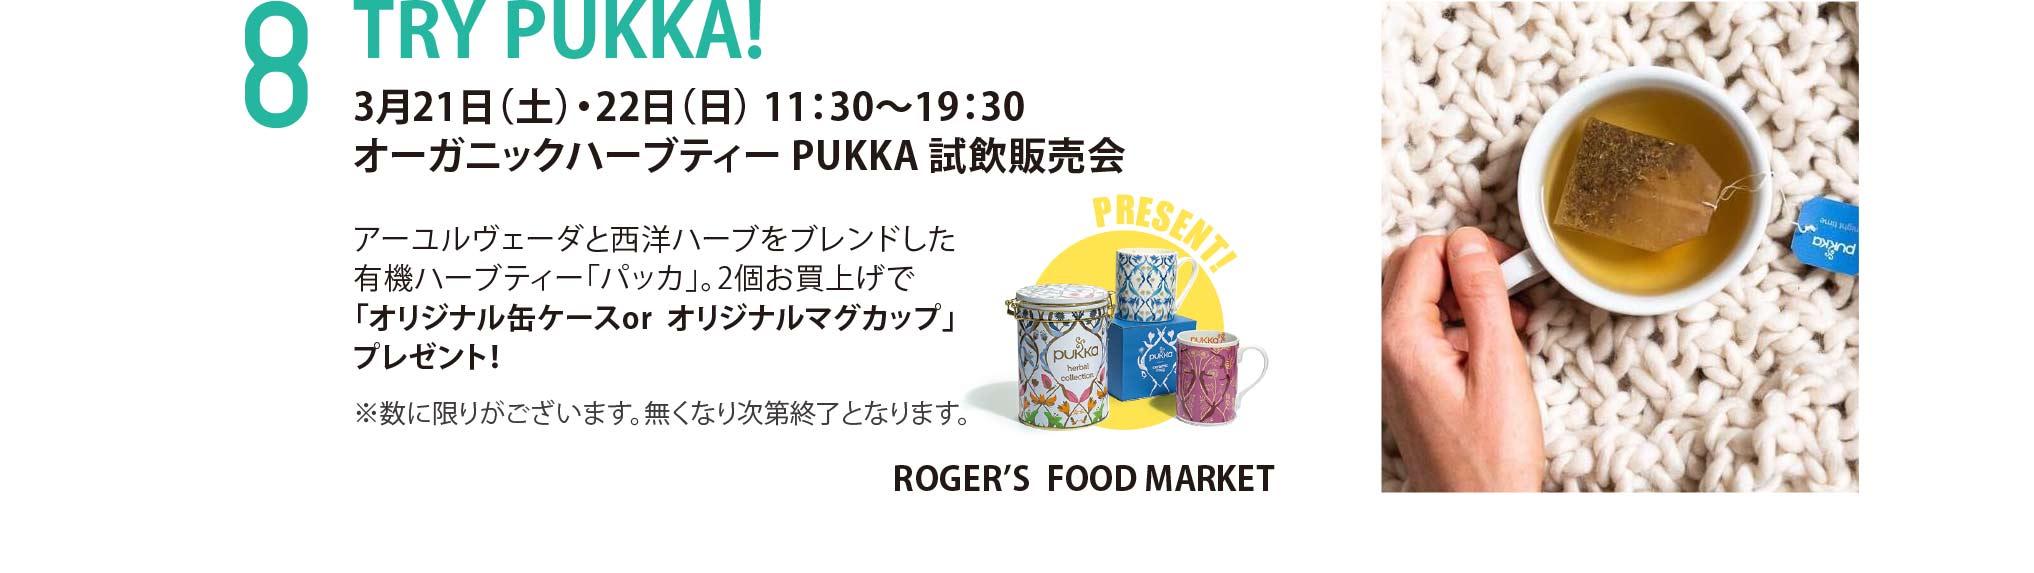 TRY PUKKA! 3/21-22 オーガニックハーブティー PUKKA 試飲販売会